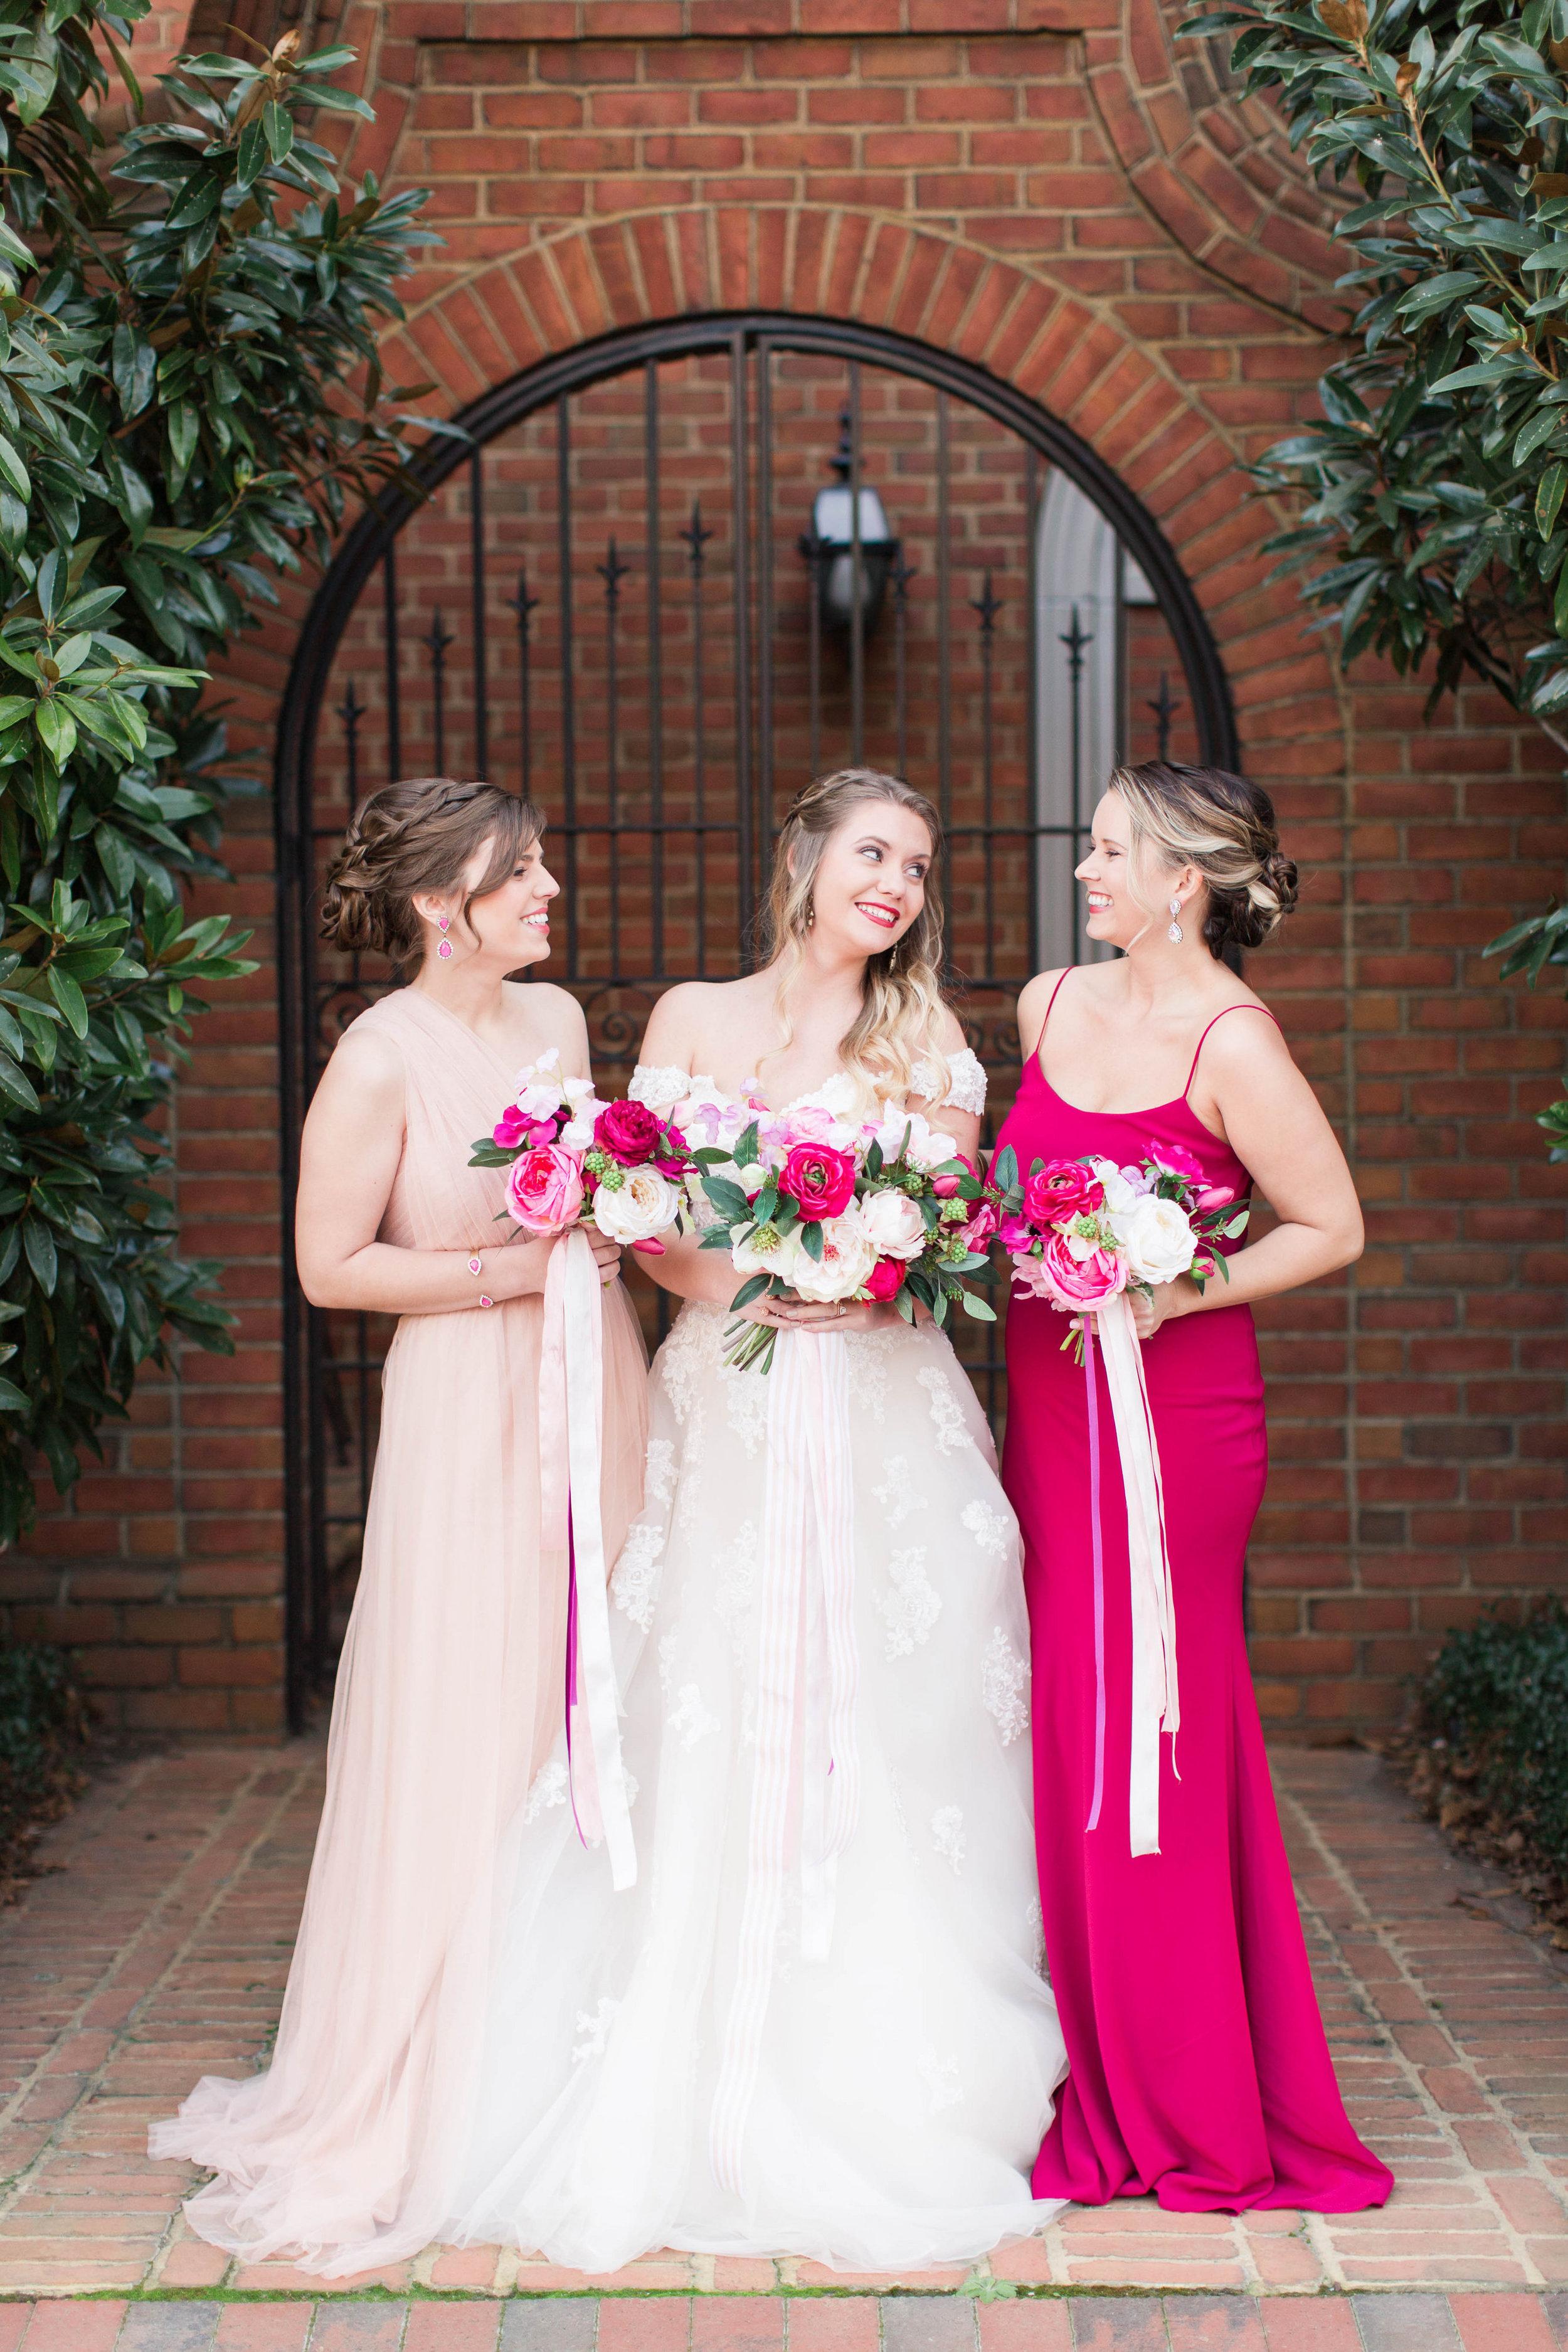 afloral-fake-flower-wedding-ivory-and-beau-bridal-boutique-maggie-sottero-saffron-the-hall-on-vine-wedding-statesboro-wedding-savannah-wedding-kristian-designs-rachel-strickland-photography-savannah-bridal-southern-bride-savannah-bride-5.jpg